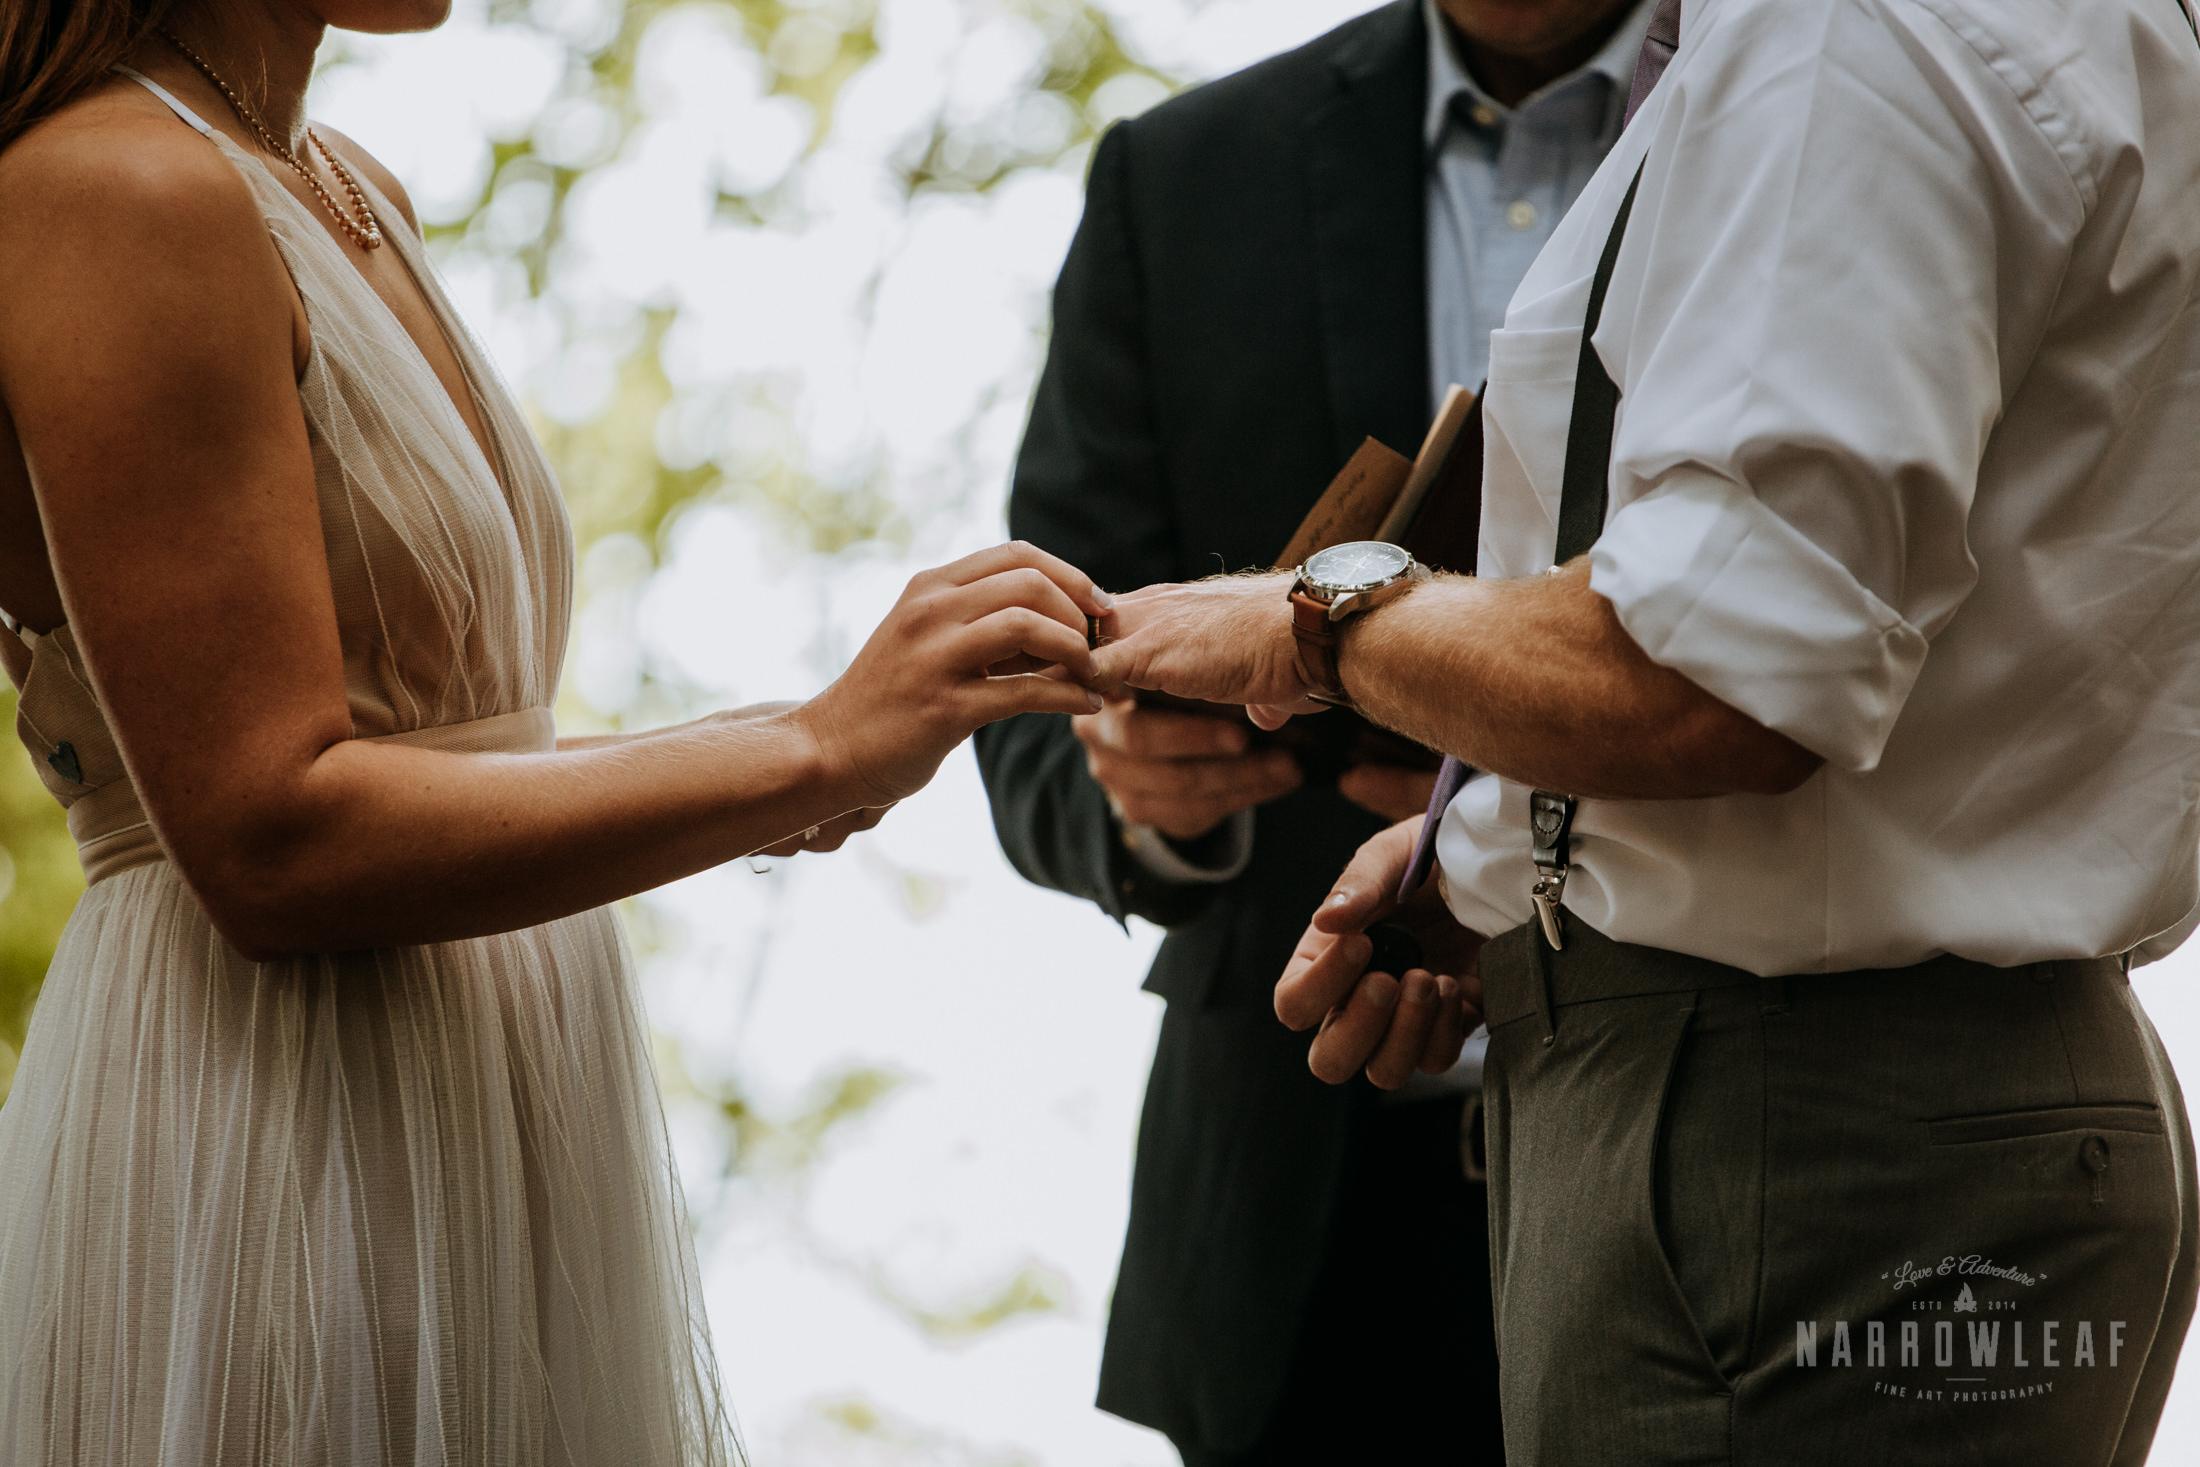 door-county-wedding-photographer-in-the-woods-Narrowleaf_Love_and_Adventure_Photography-8149.jpg